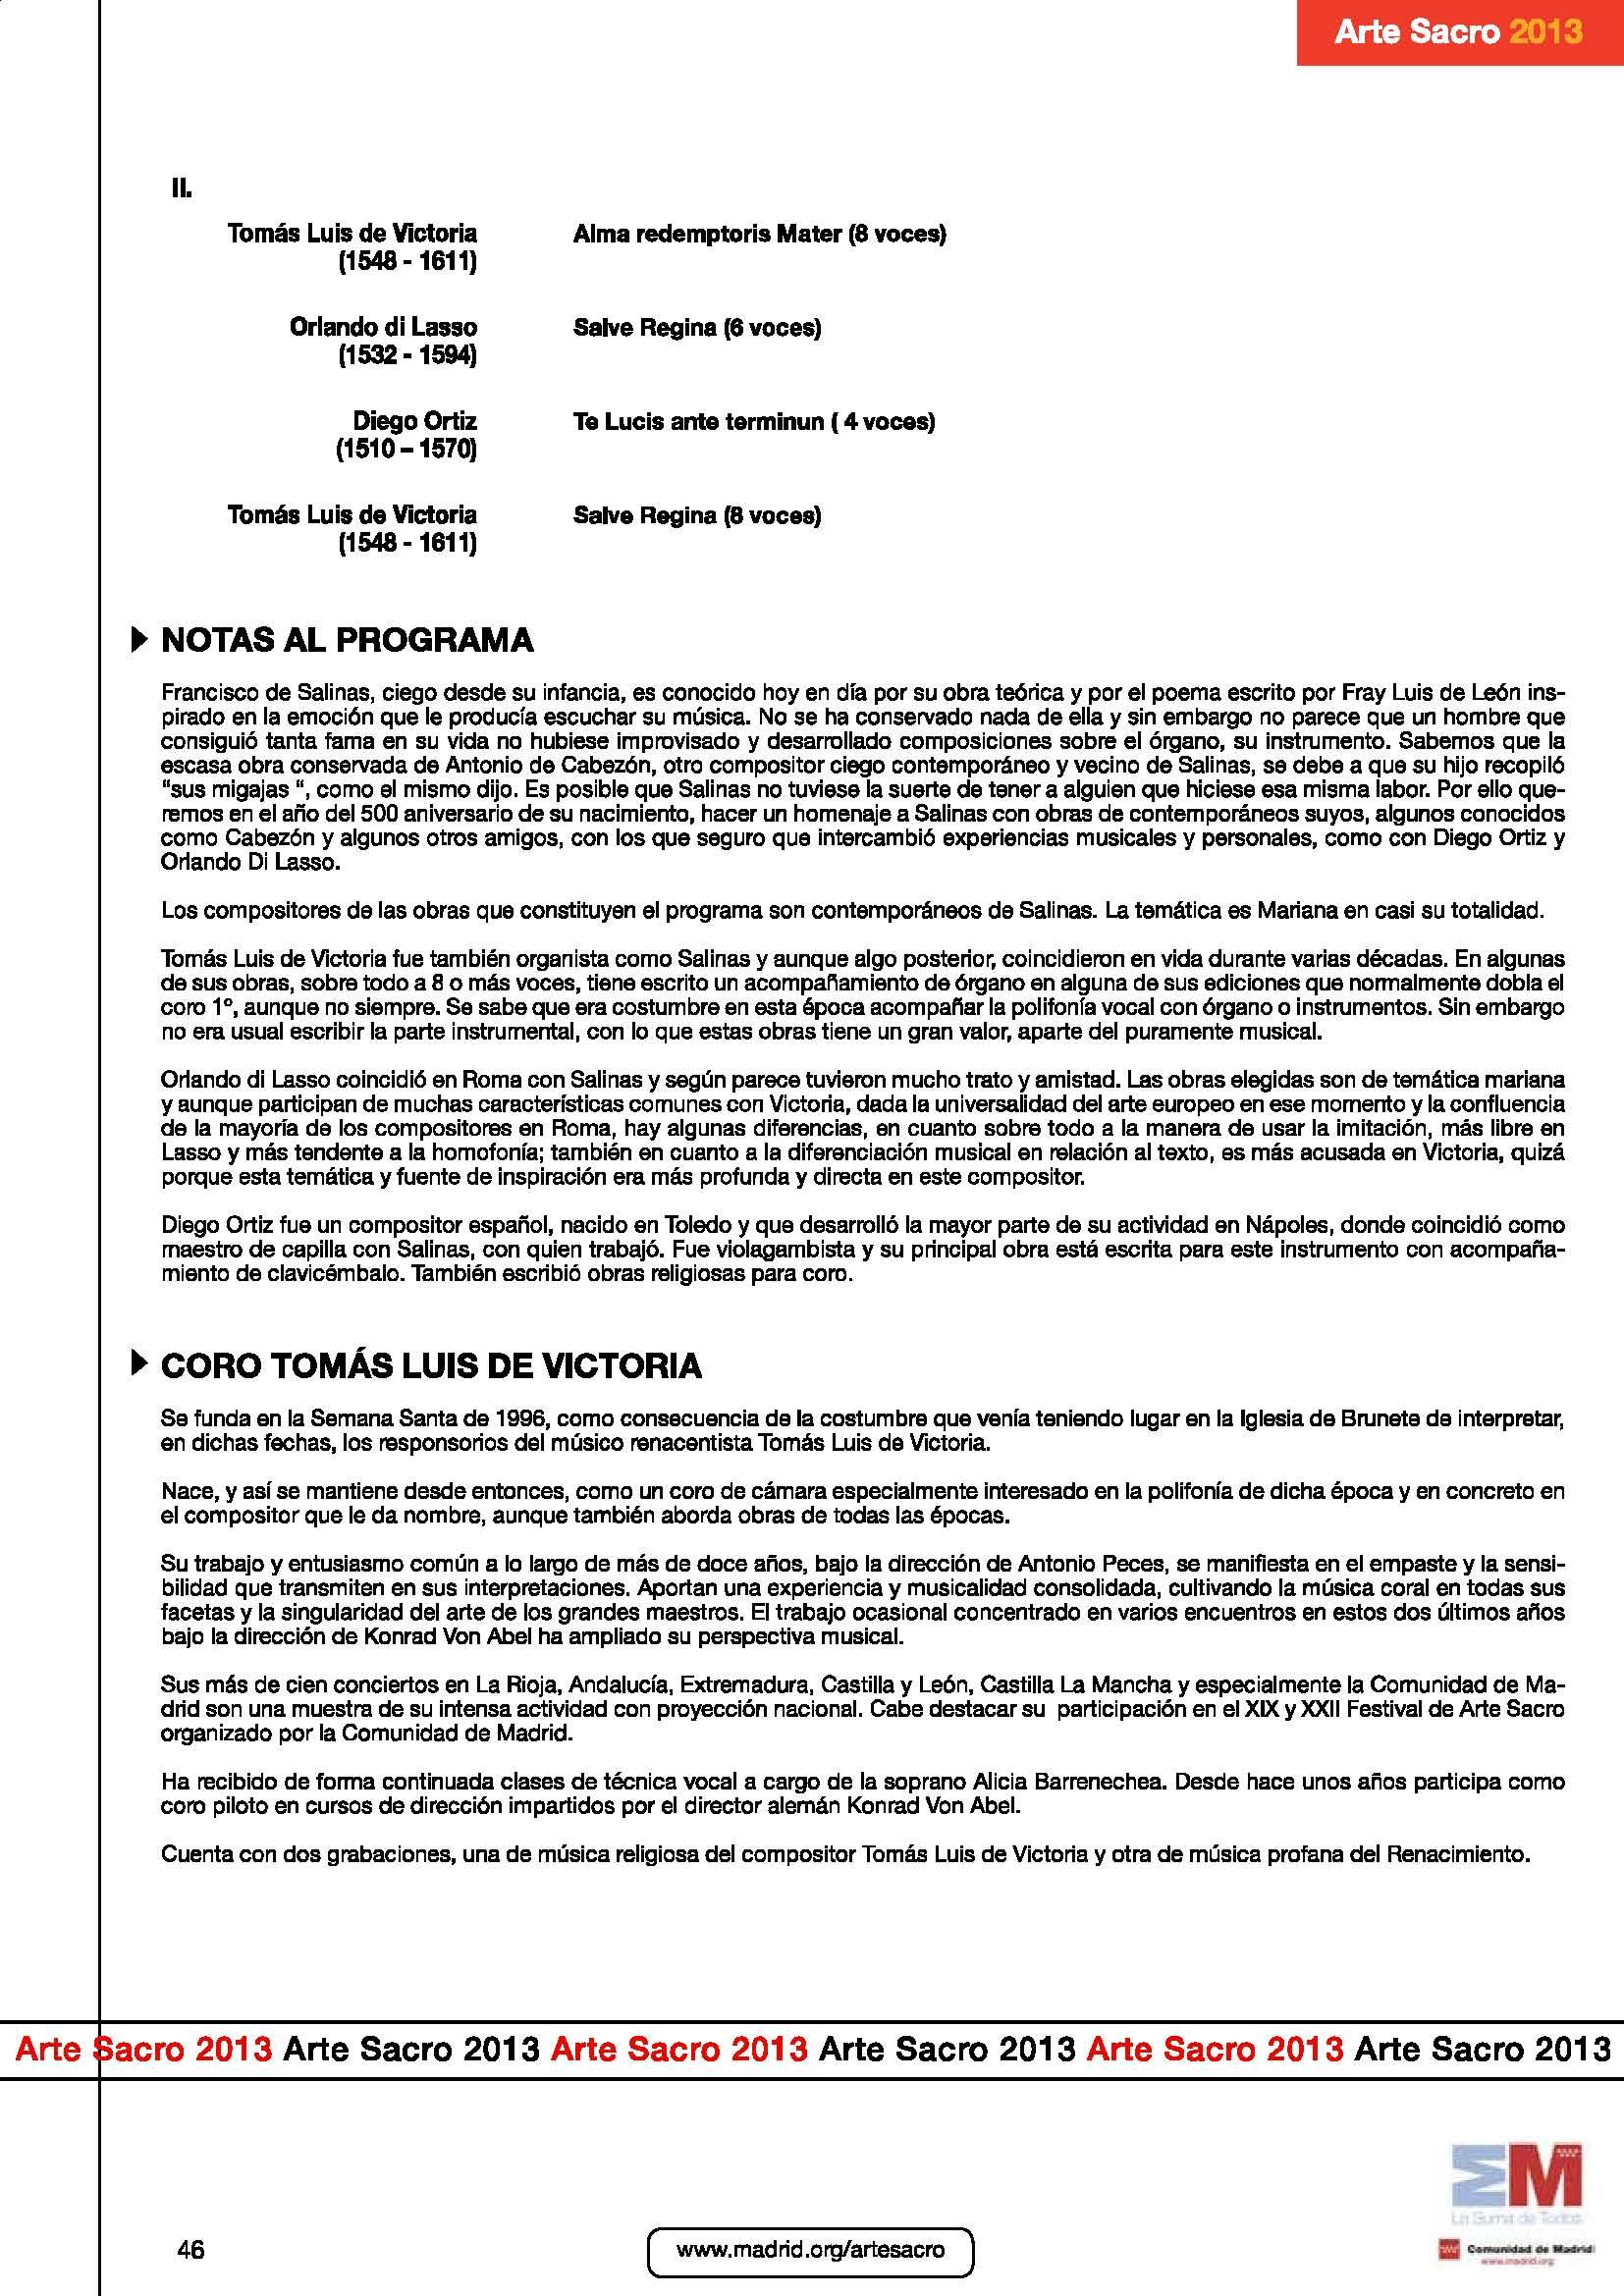 dossier_completo_Página_046